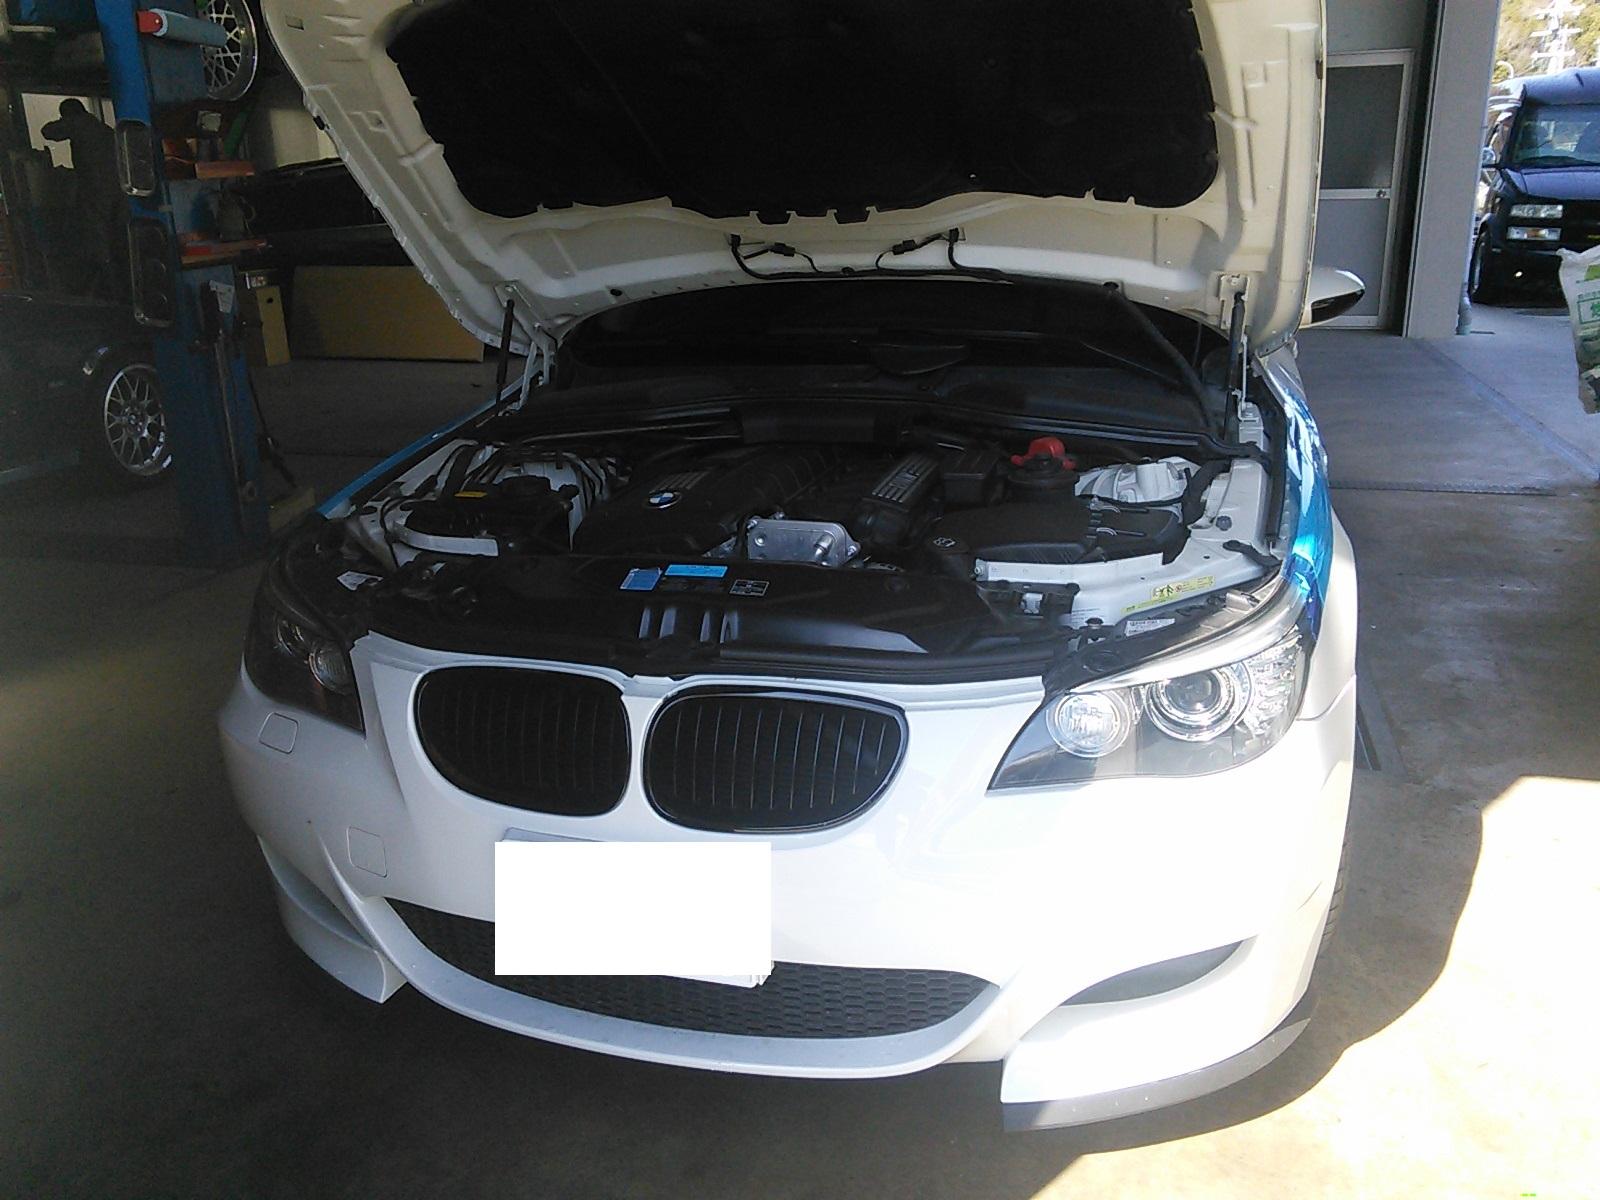 BMW E60 エンジン冷間時 タペット音大きい 異音の動画あり